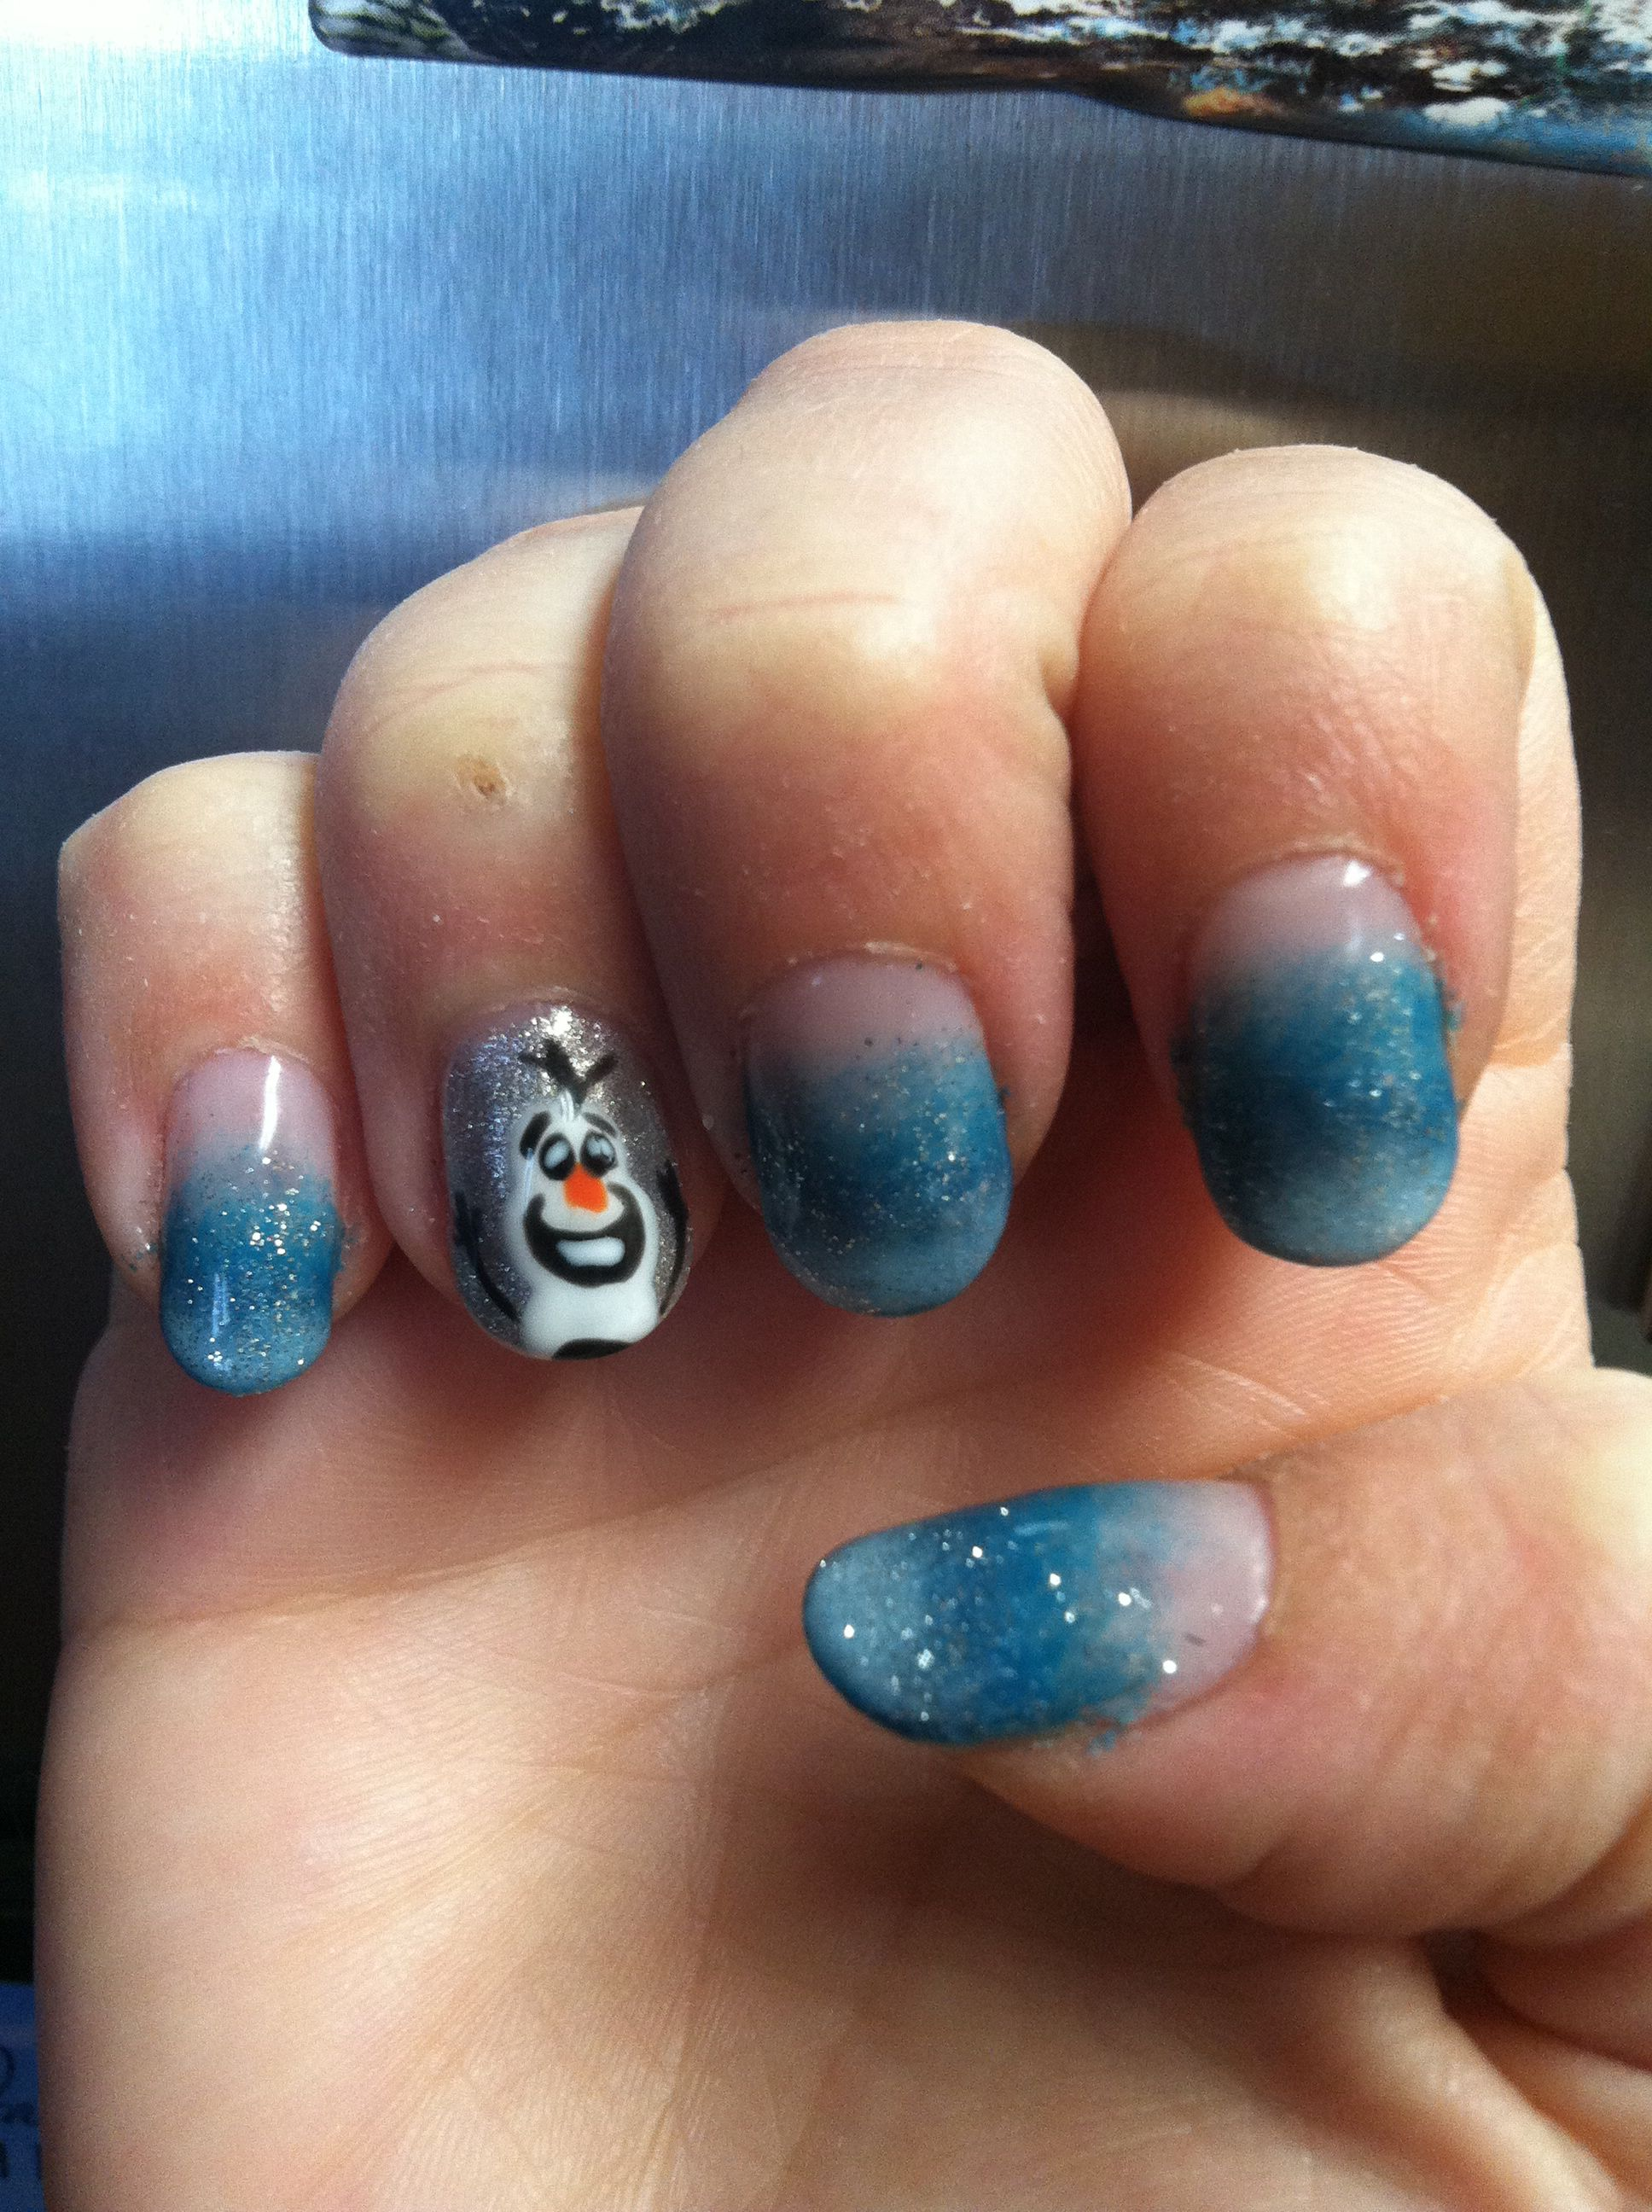 Olaf from Disney\'s Frozen nails #frozen #olaf #nailart | Nail Art ...